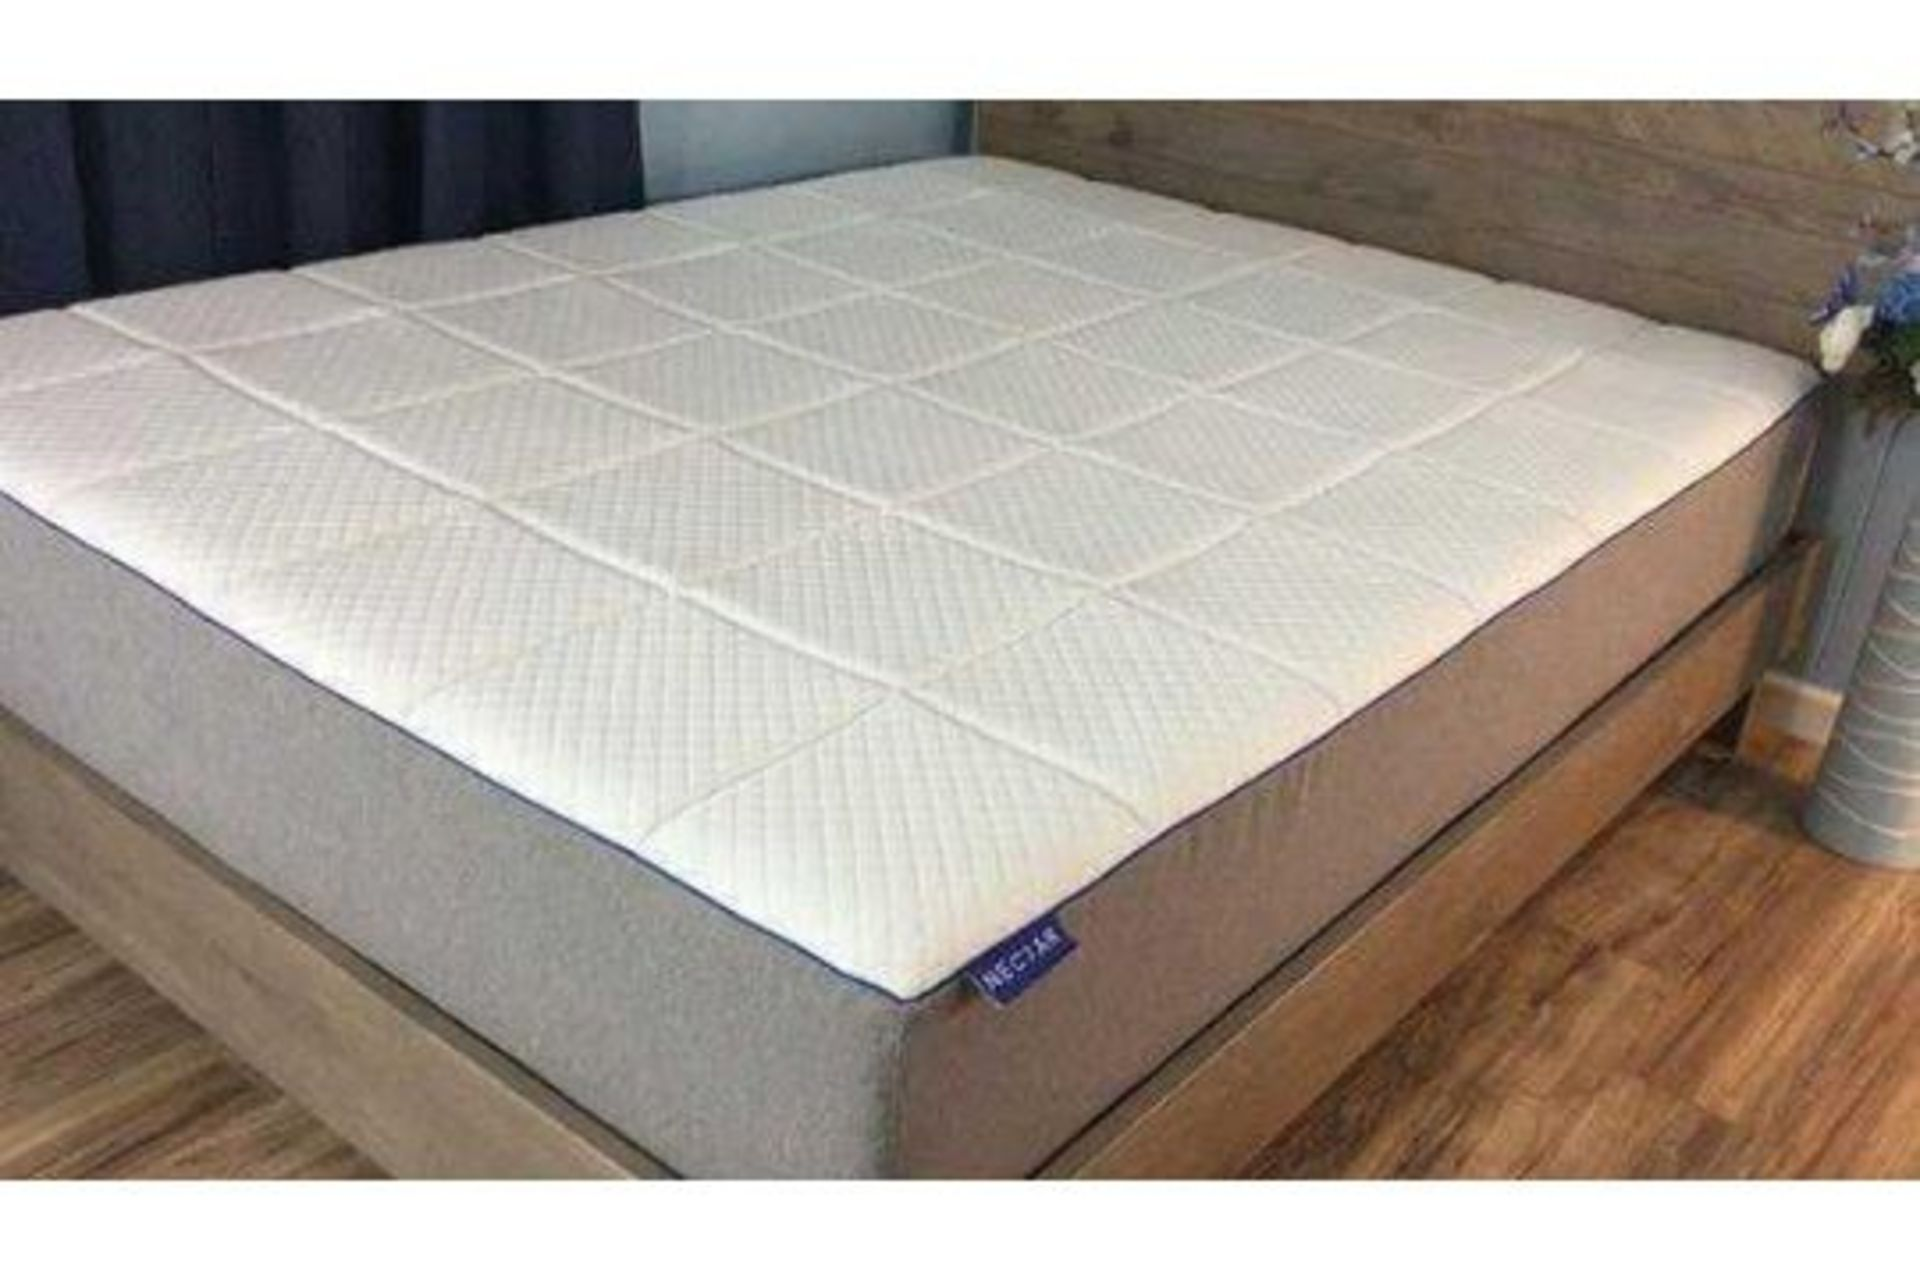 RRP £400 Bagged Nectar Pressure Releaving Memory Foam Single Mattress With 3-Layer Foam